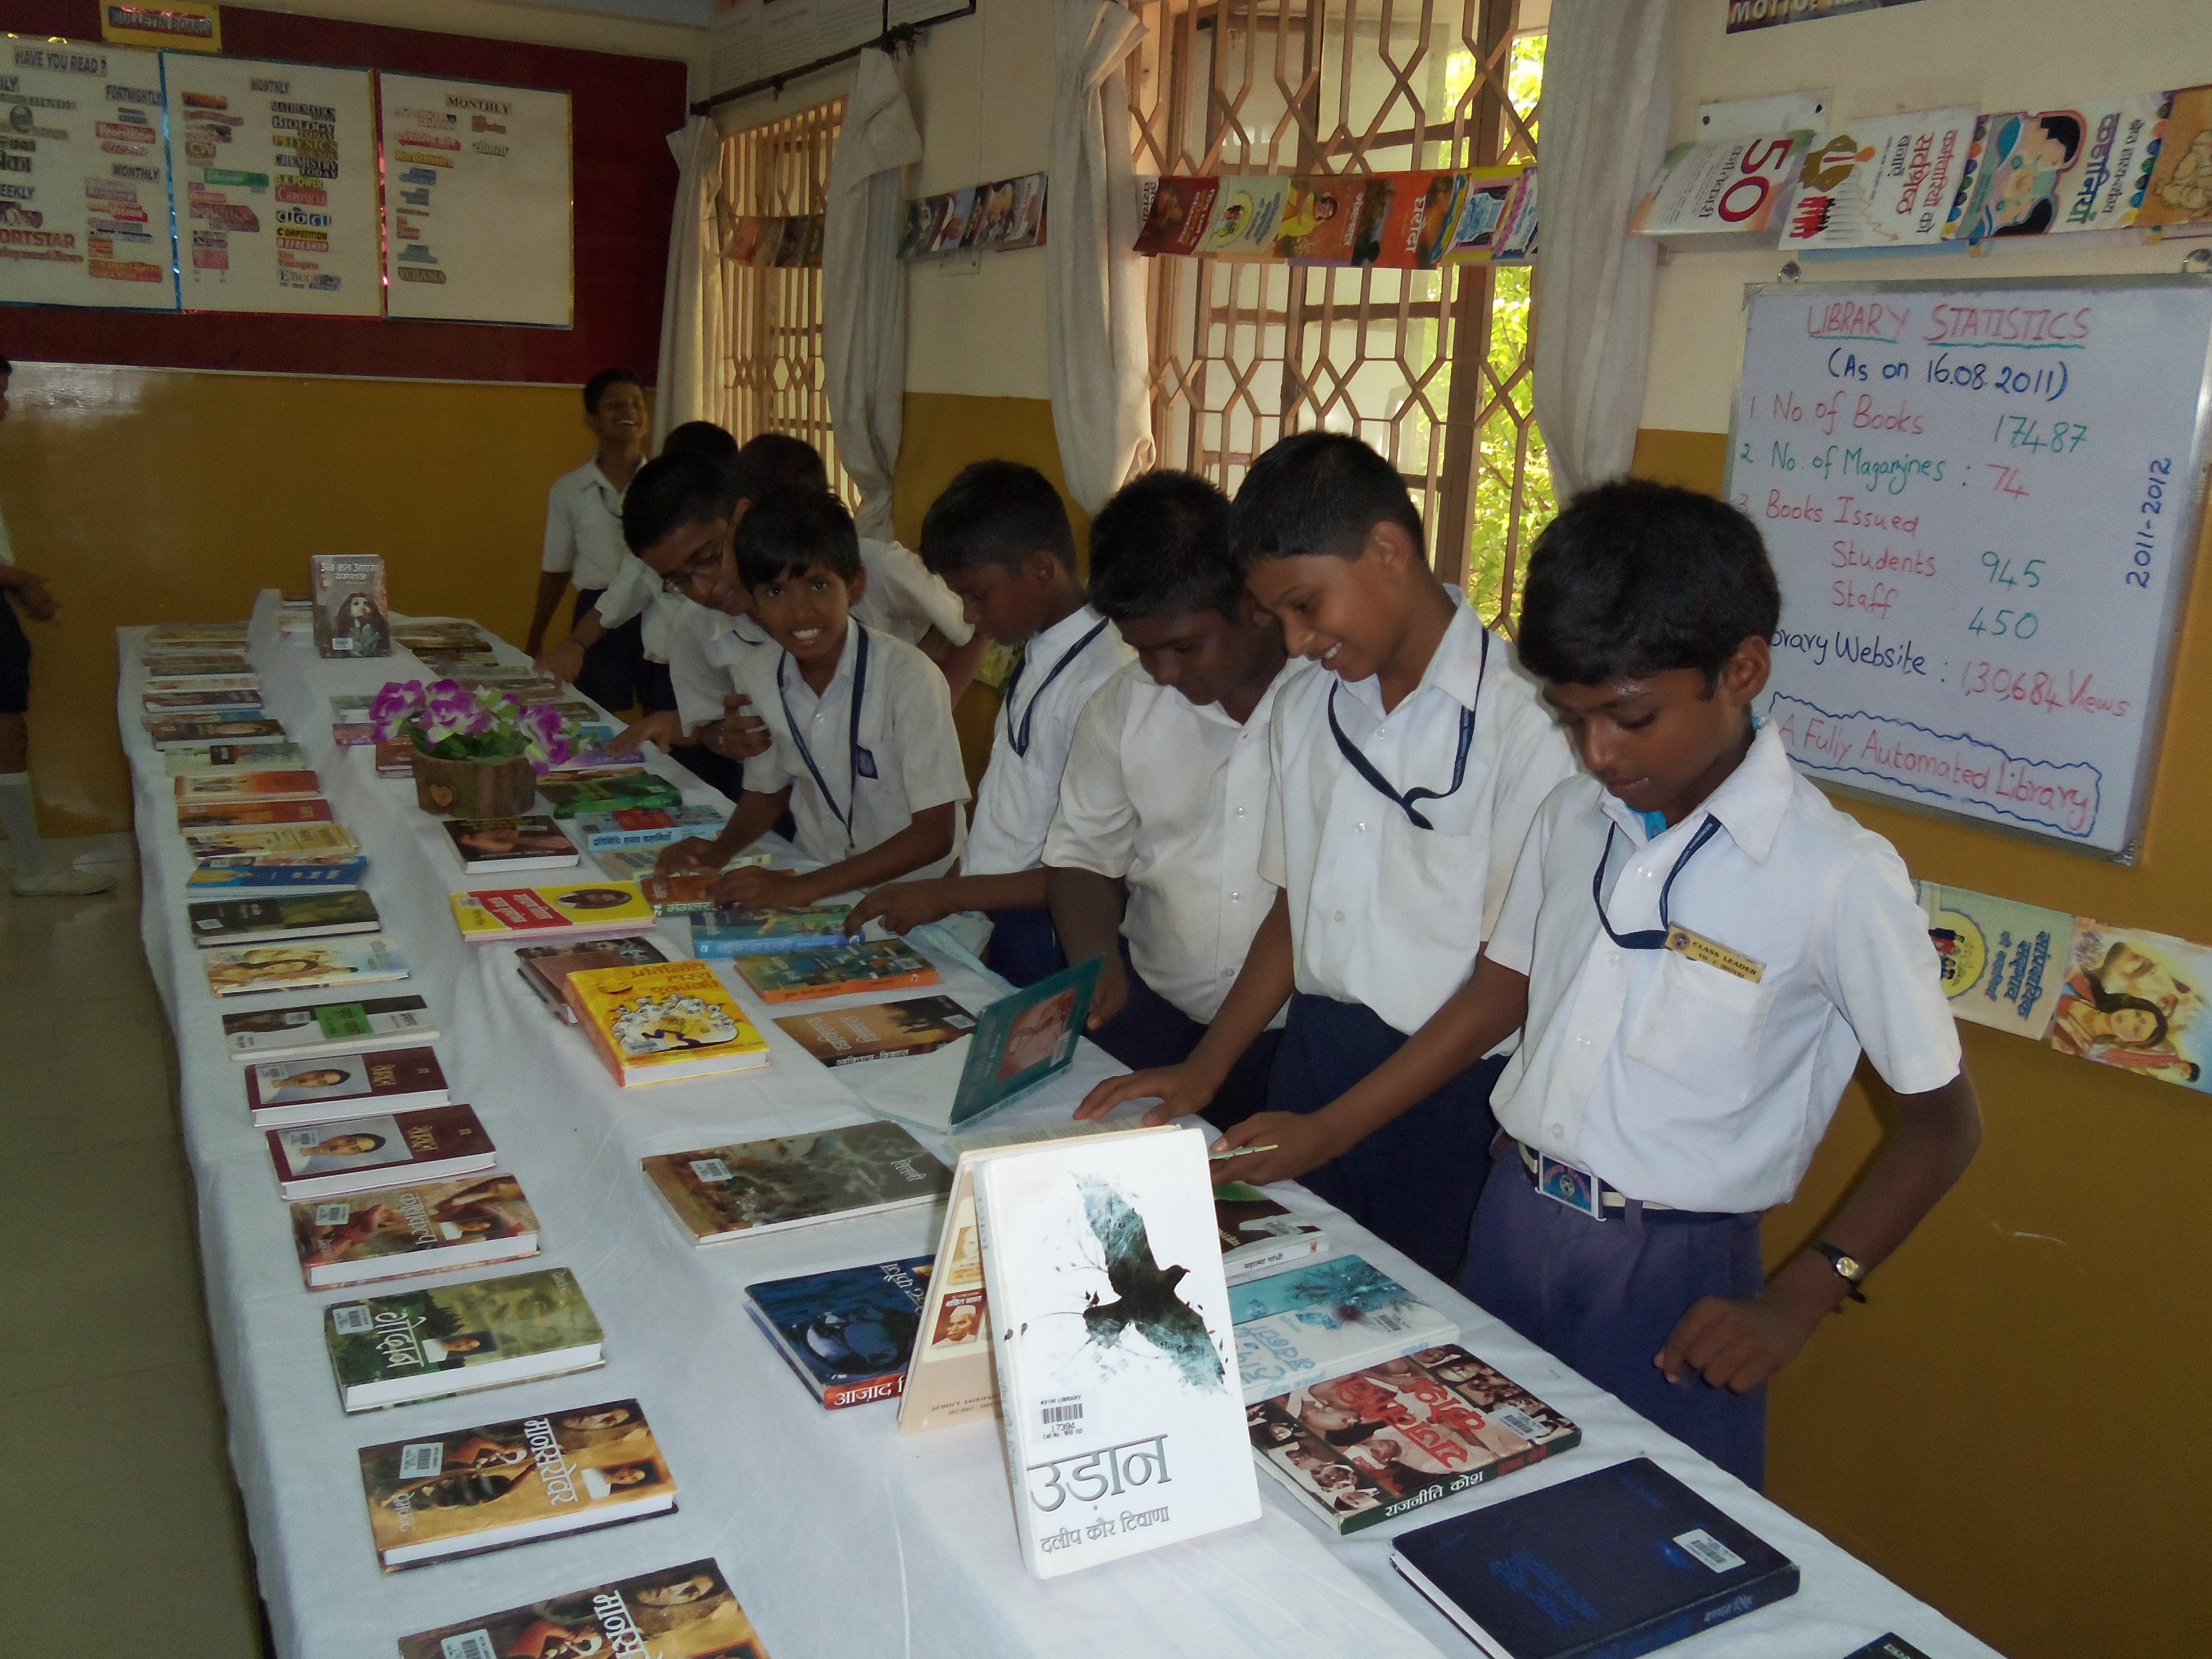 Hindi Books Exhibition Photo Gallery 01